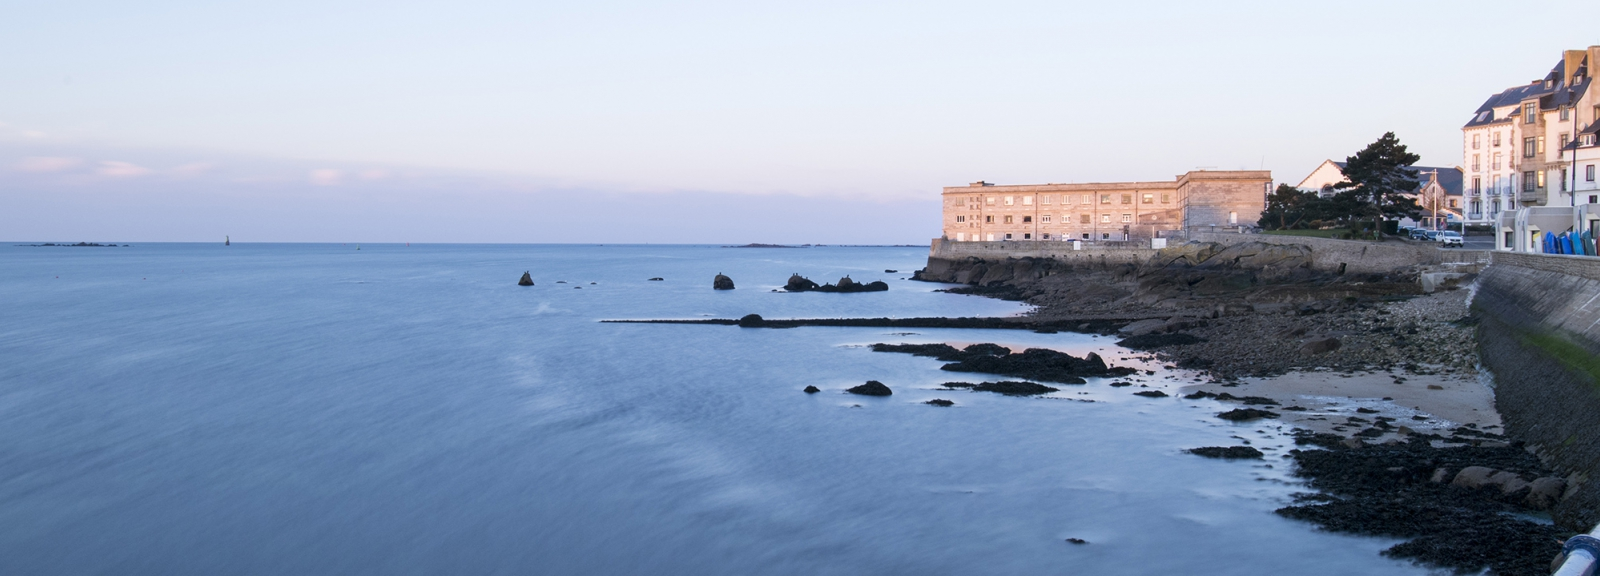 Station marine de Concarneau © MNHN - Agnès Iatzoura